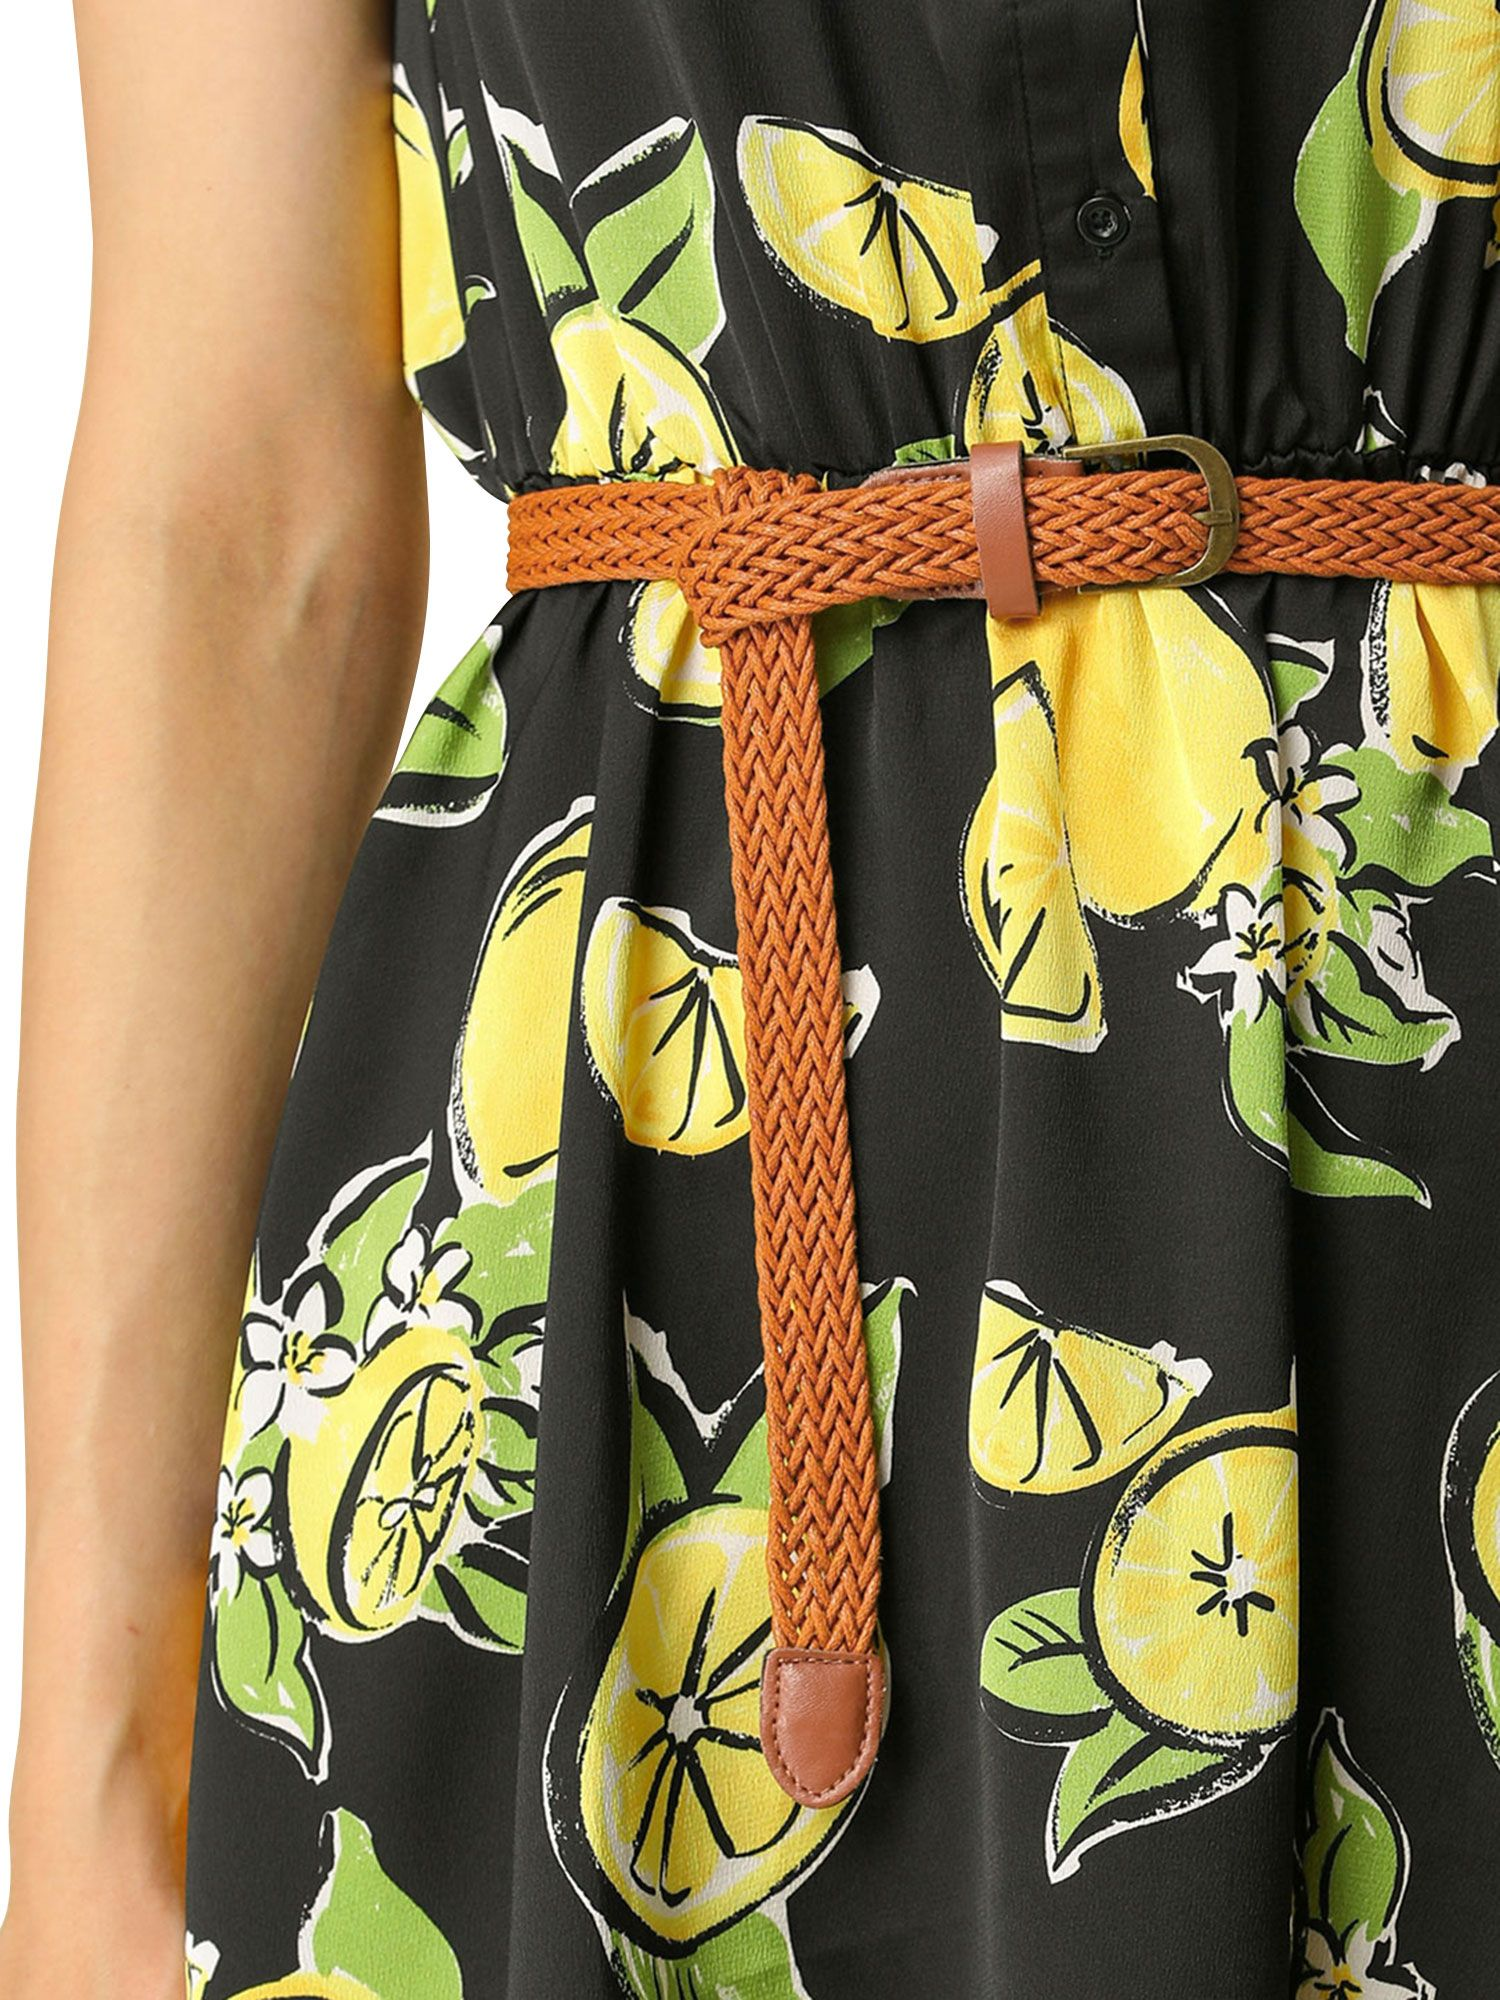 Unique Bargains Unique Bargains Women S Sleeveless Unlined Above Knee Mini Belted Dress Walmart Com Mini Shirt Dress Casual Style Outfits Sleeveless Mini Dress [ 2000 x 1500 Pixel ]